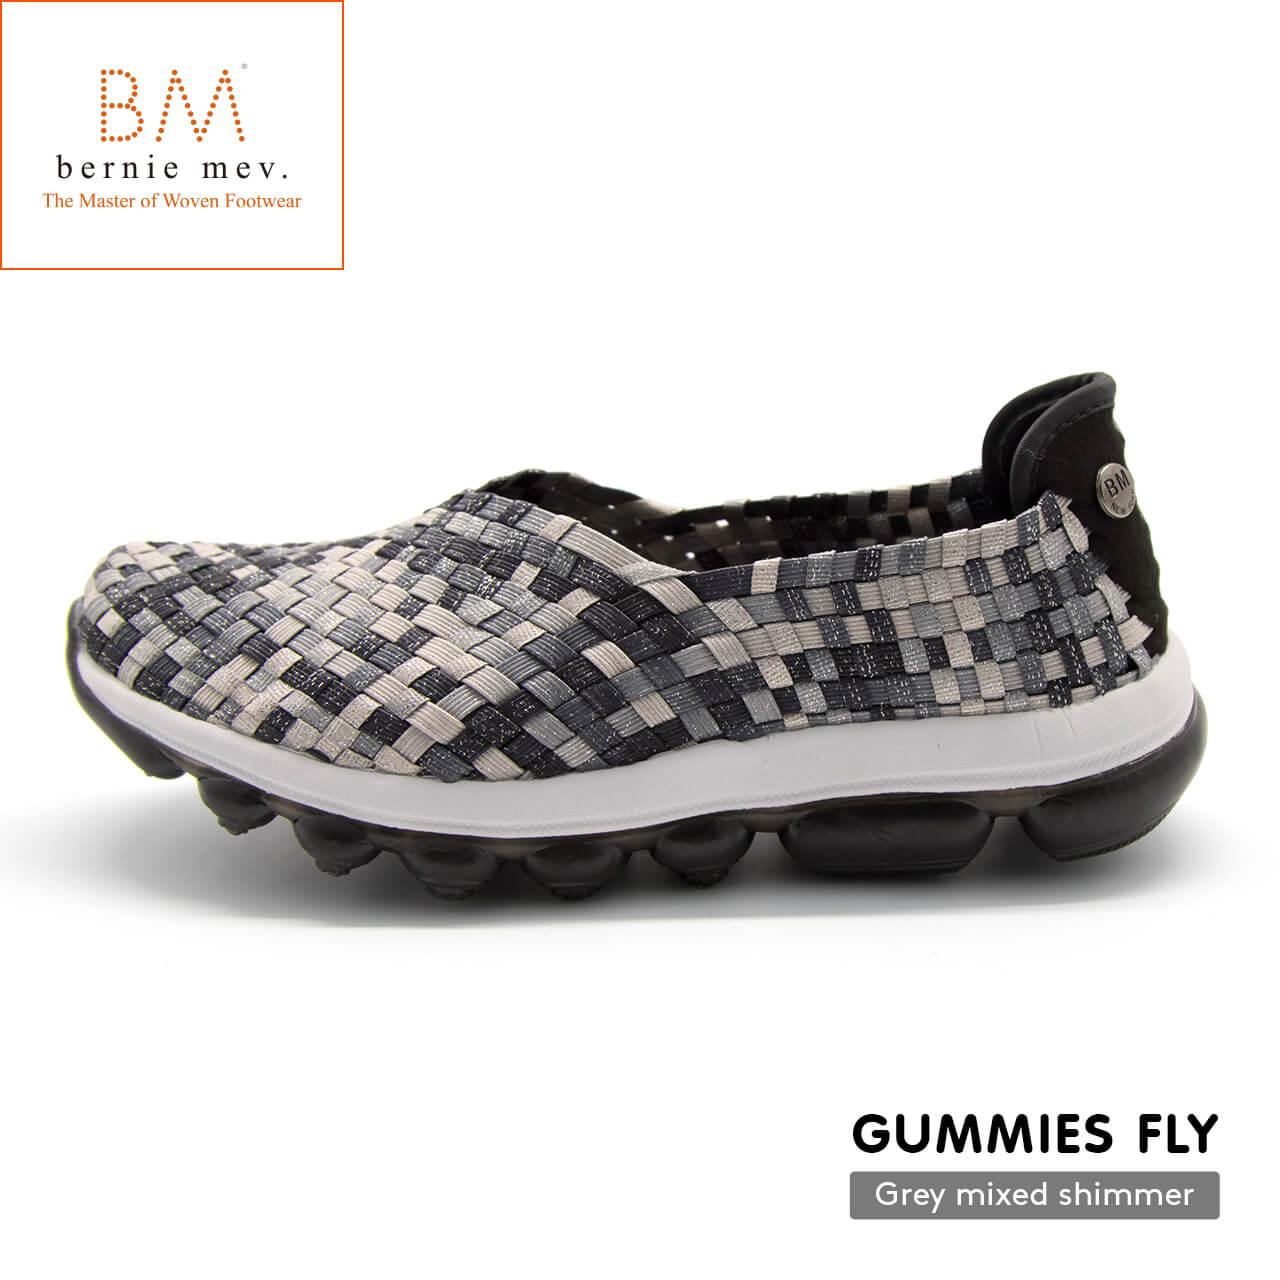 Bernie mev.(バーニーメブ)Gummies Fly(ガミーズフライ)Grey Mixed Shimmer(グレイミックスドシマー)履きやすい軽いおしゃれスニーカー